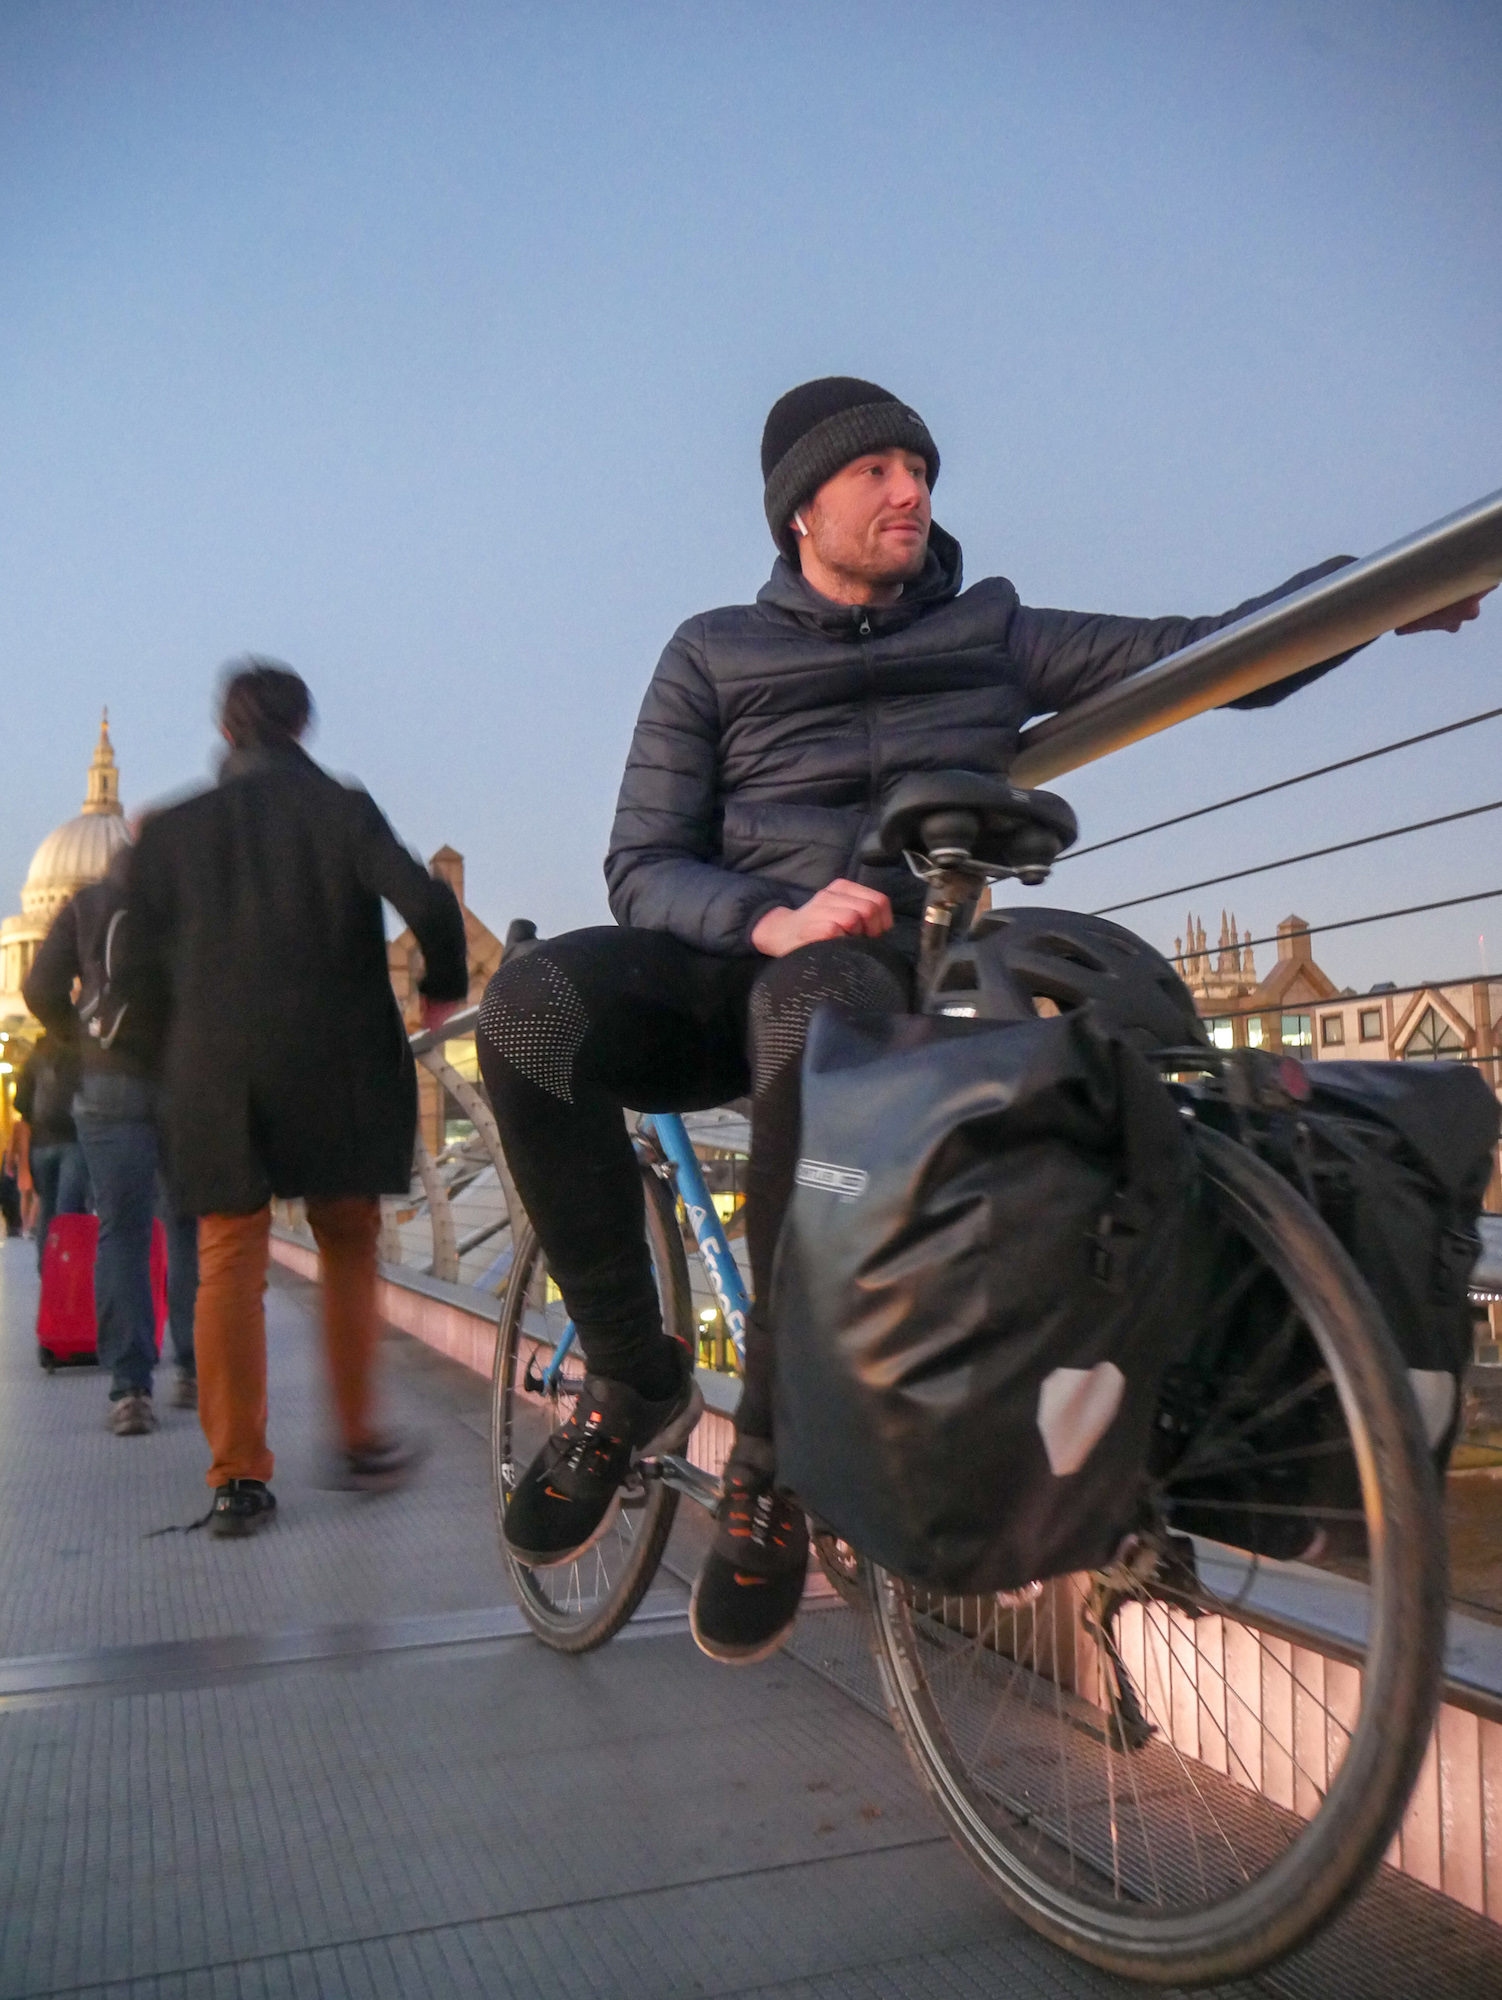 Joshua takes in the views from Millennium bridge